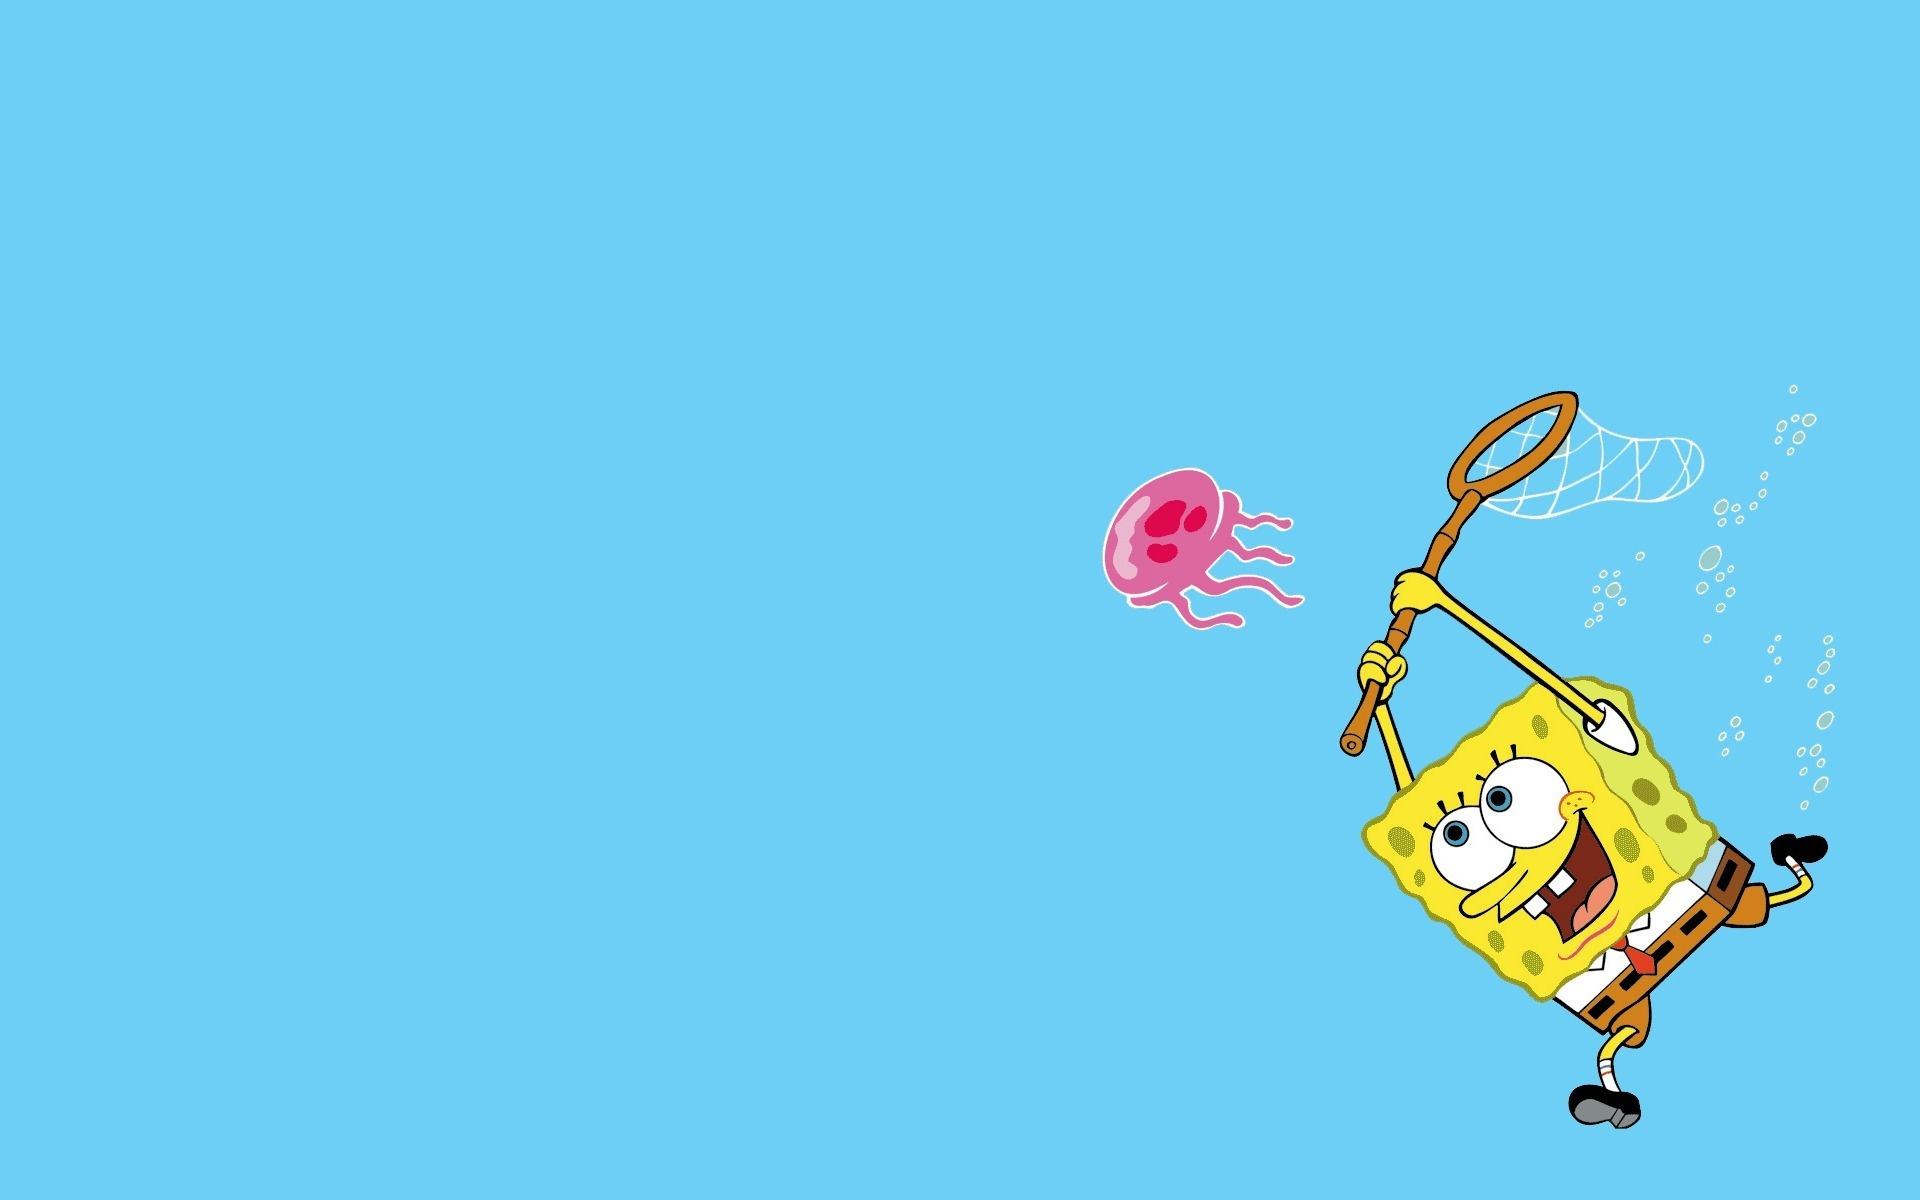 Spongebob   Spongebob Squarepants Wallpaper 31312949 1920x1200